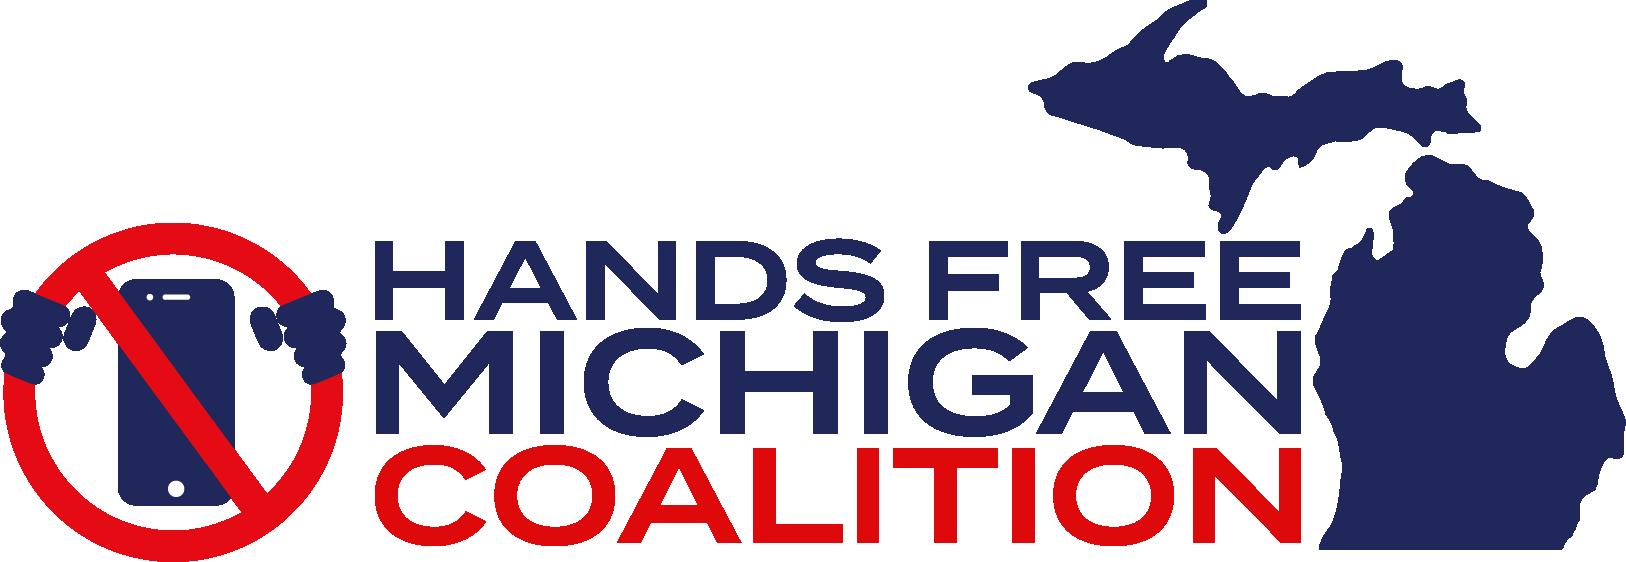 Hands Free Michigan Coalition Logo